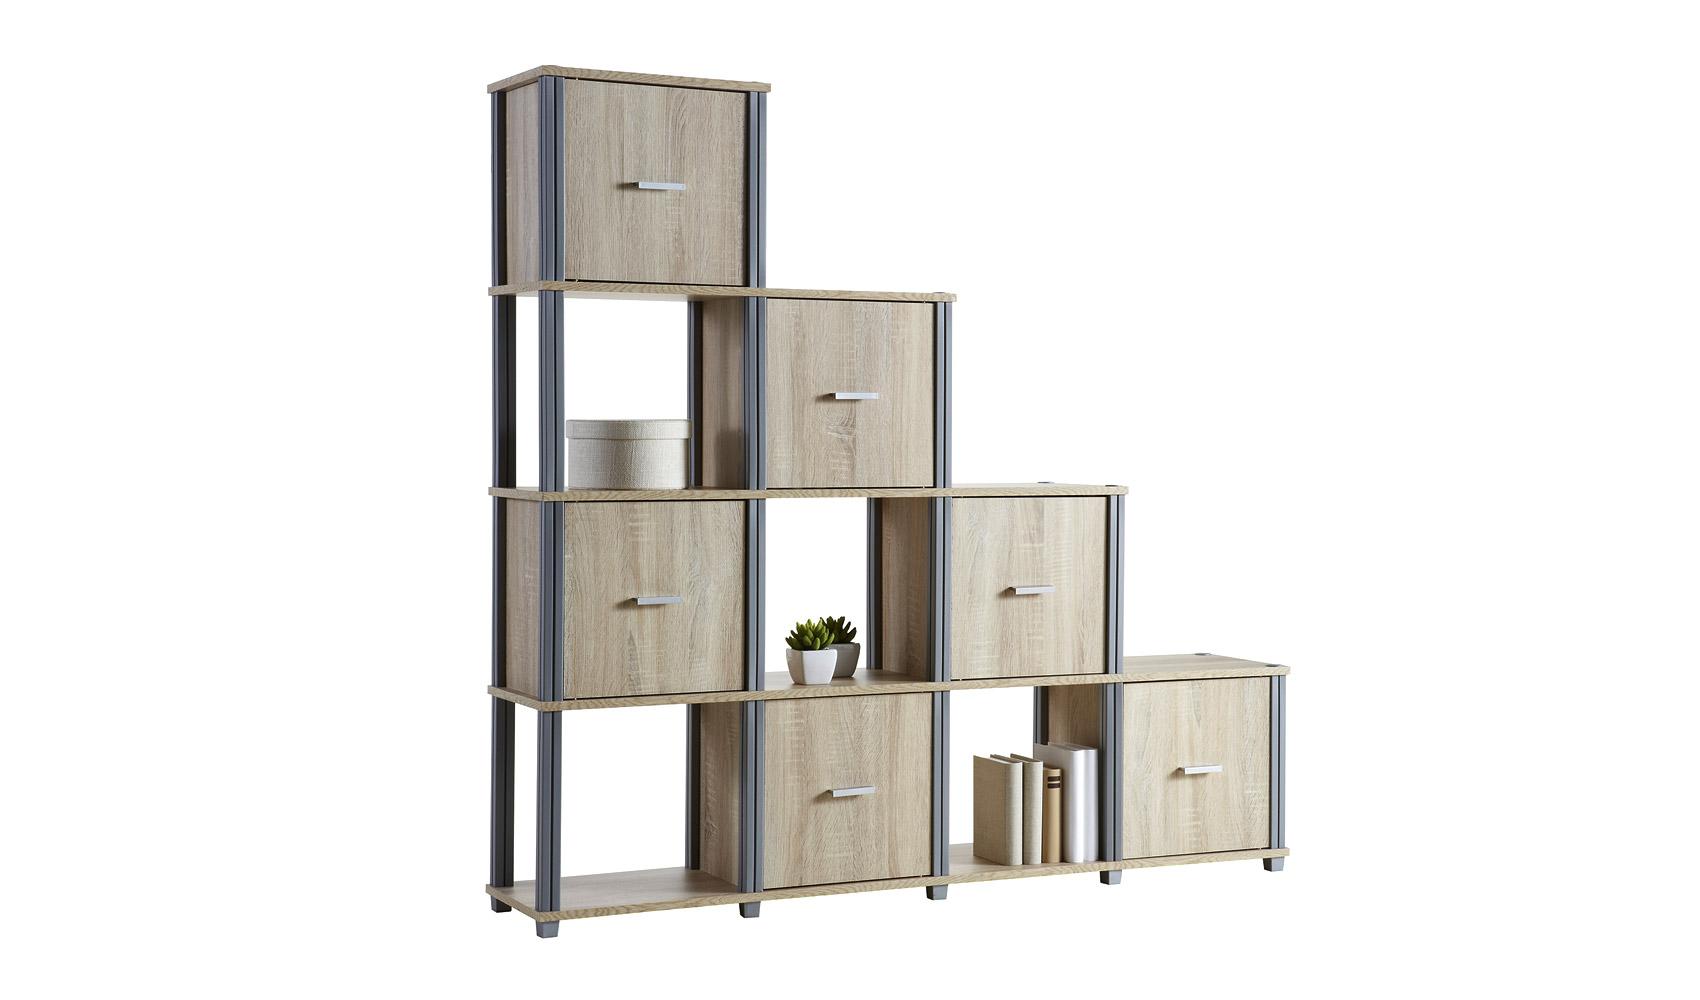 stufenregal regal dachschr ge b cherregal eiche sonoma ebay. Black Bedroom Furniture Sets. Home Design Ideas